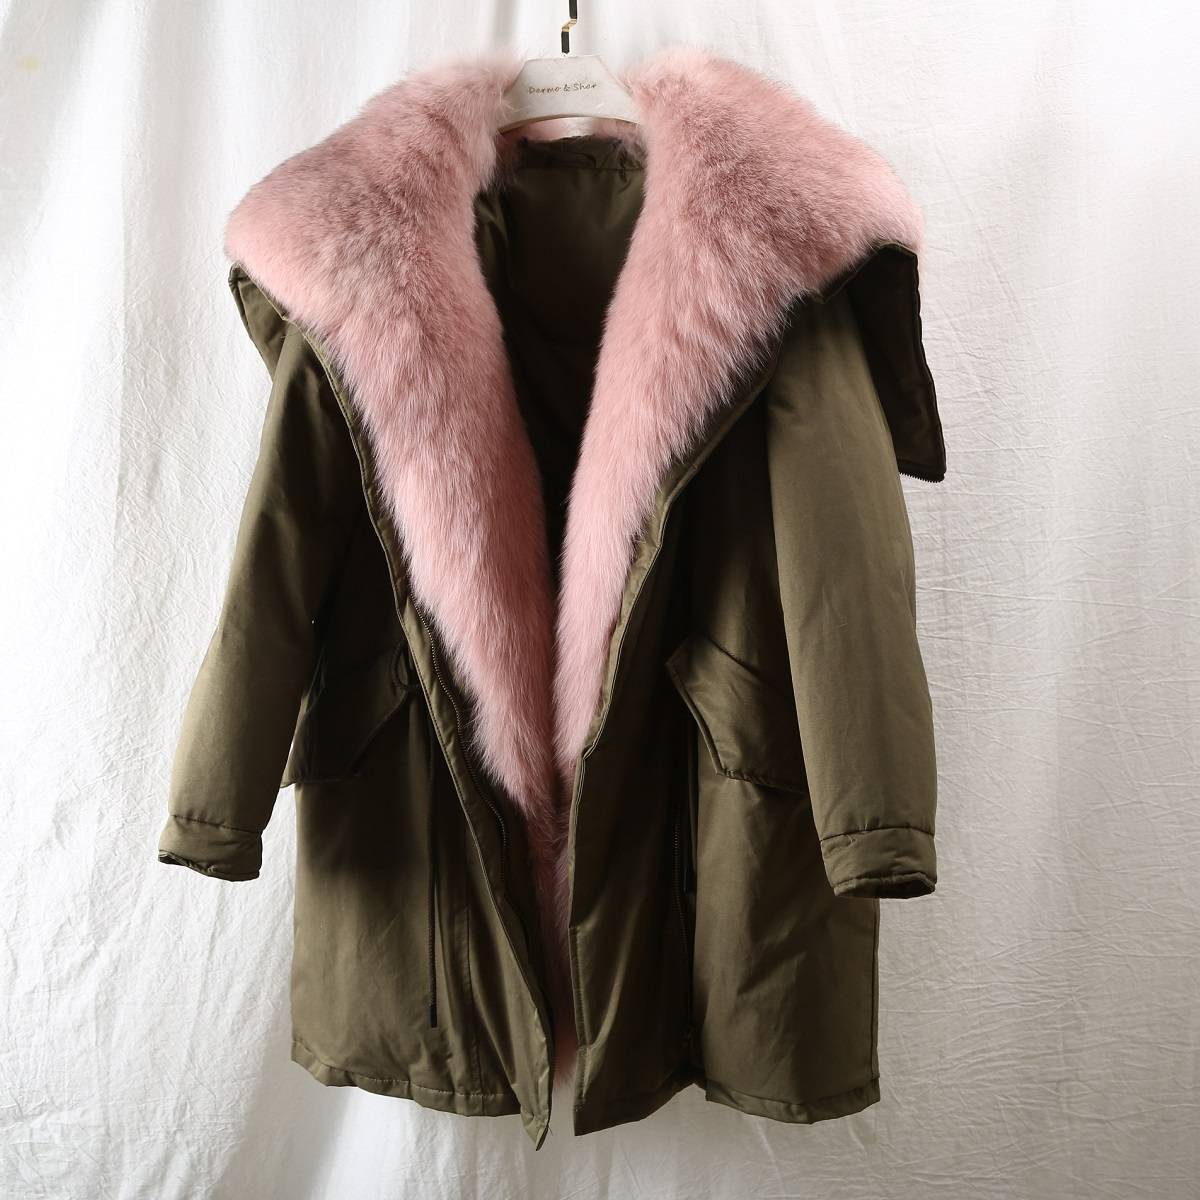 OFTBUY Real Fox Fur Duck Down Coat Winter Jacket Women Long Parka Natural Outerwear Thick Warm Detachable Oversize Streetwear